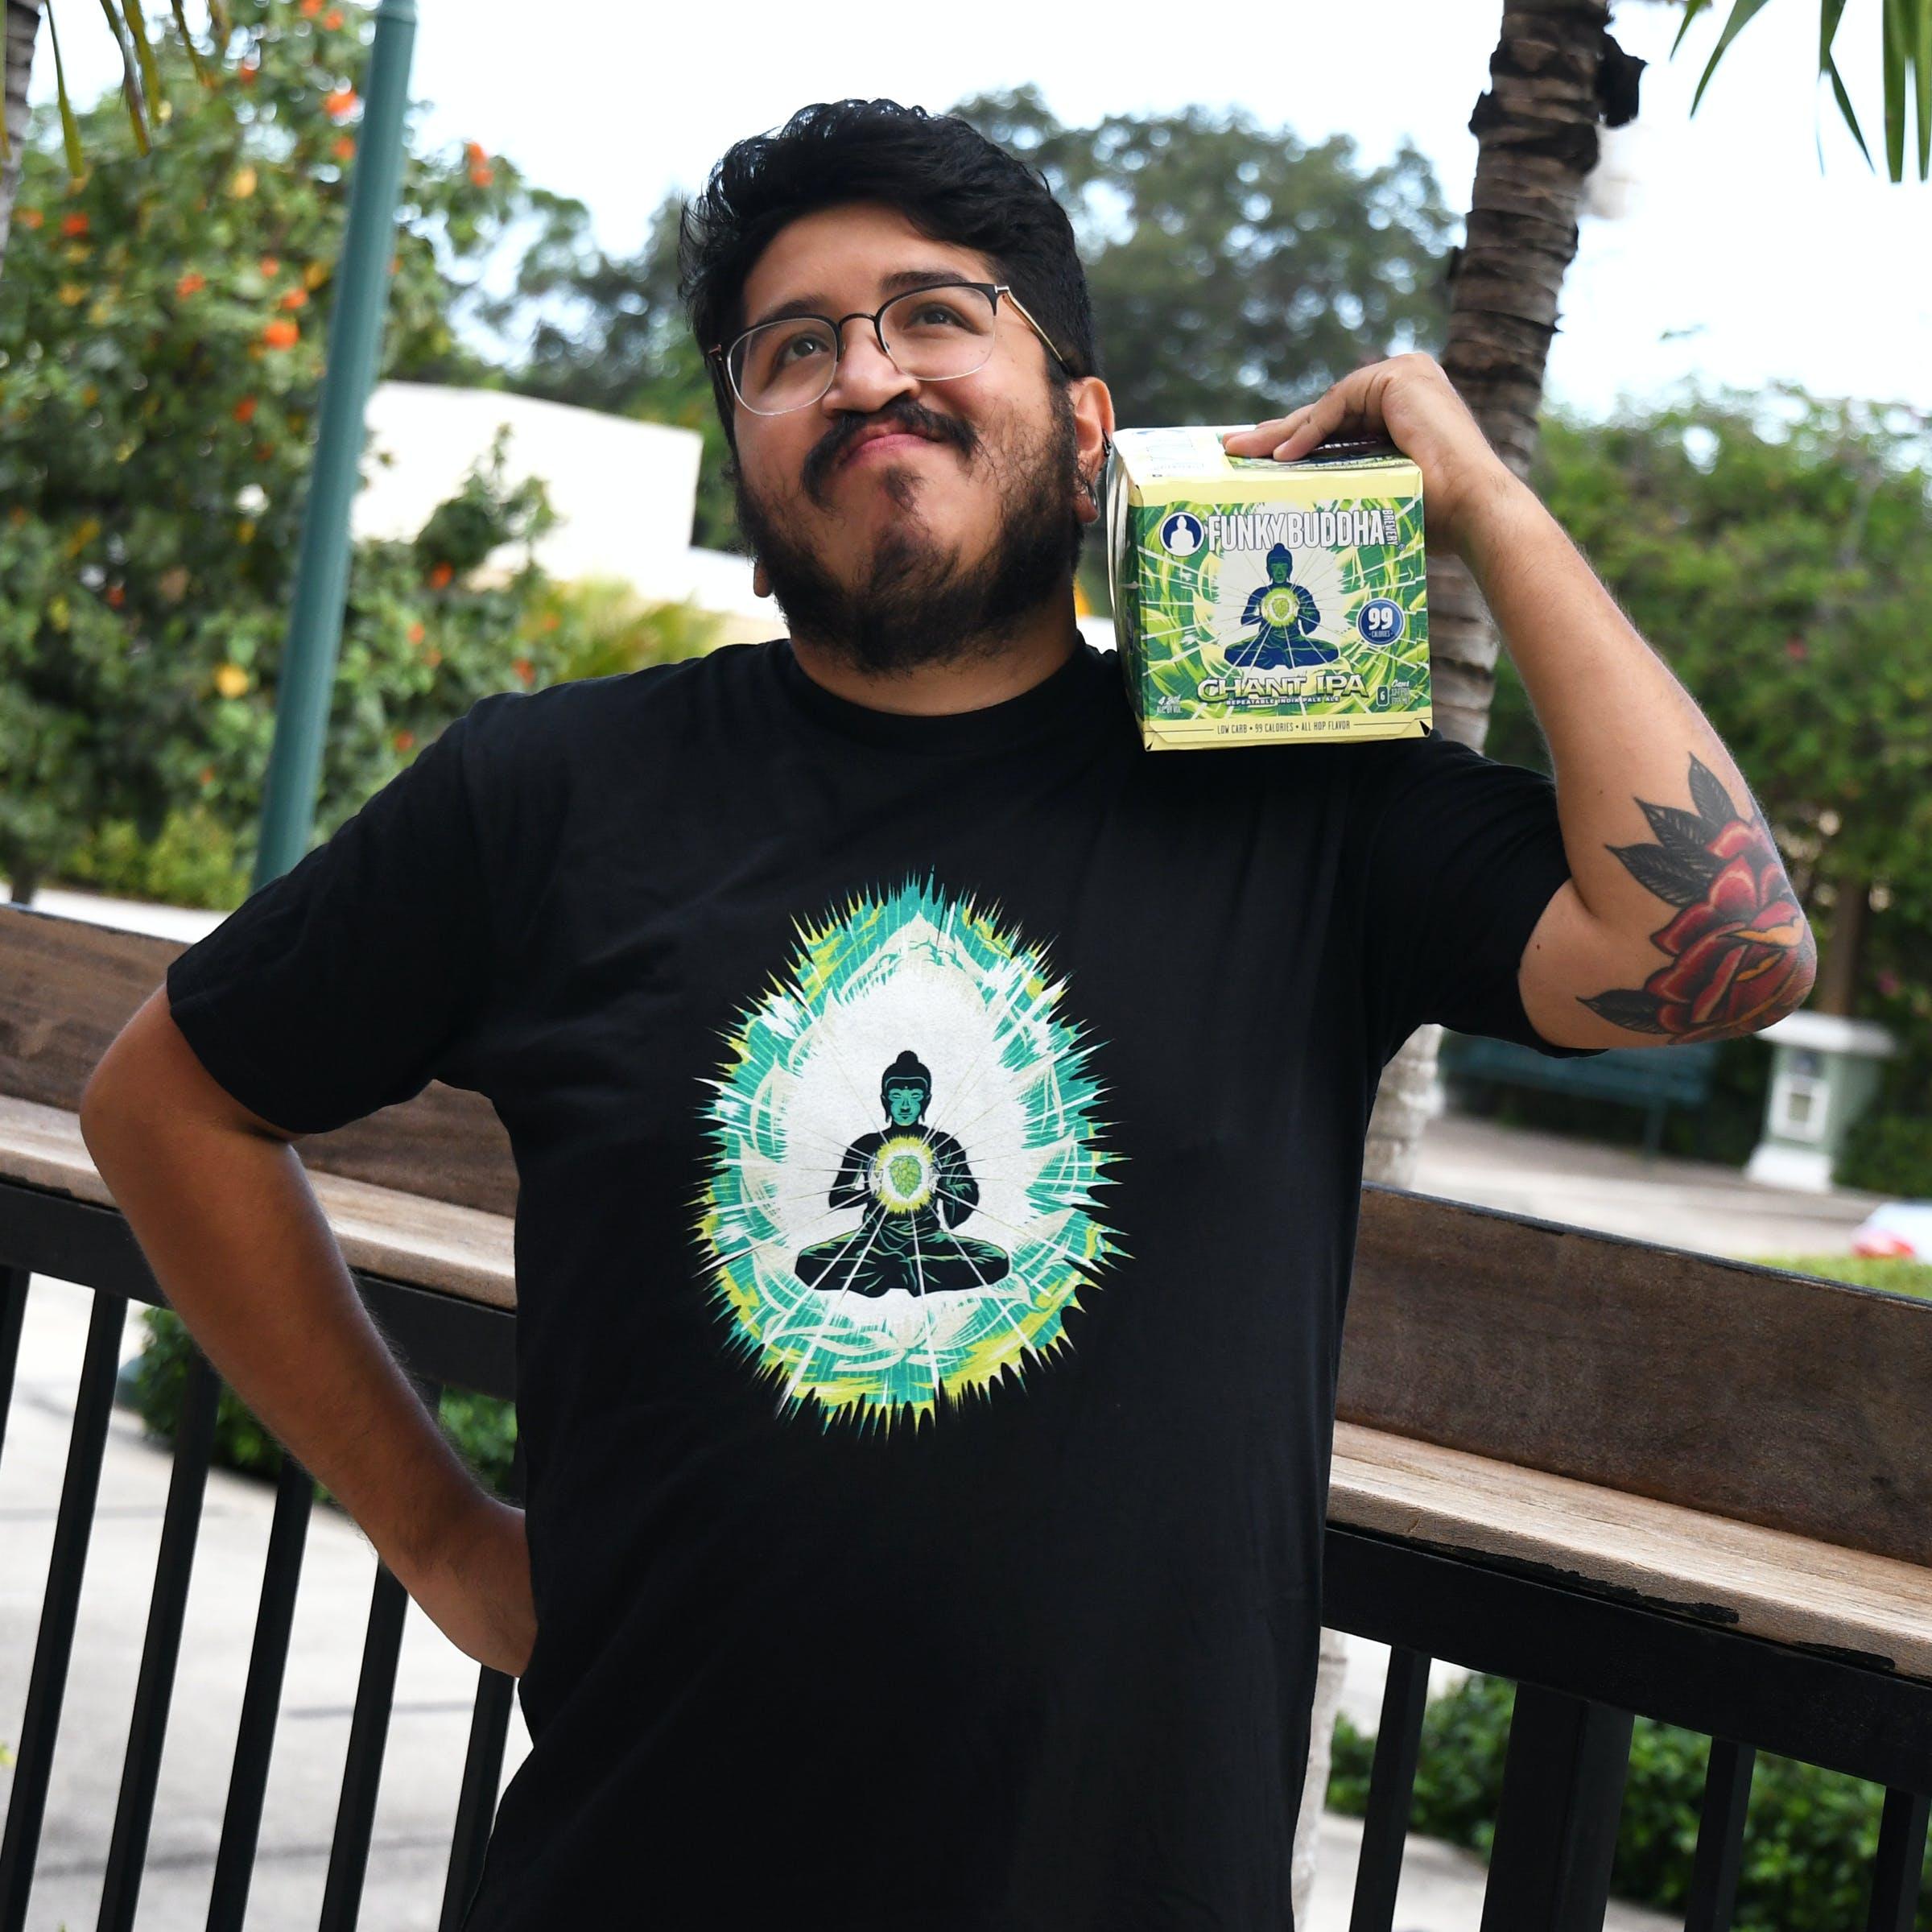 Chant IPA six-pack and shirt